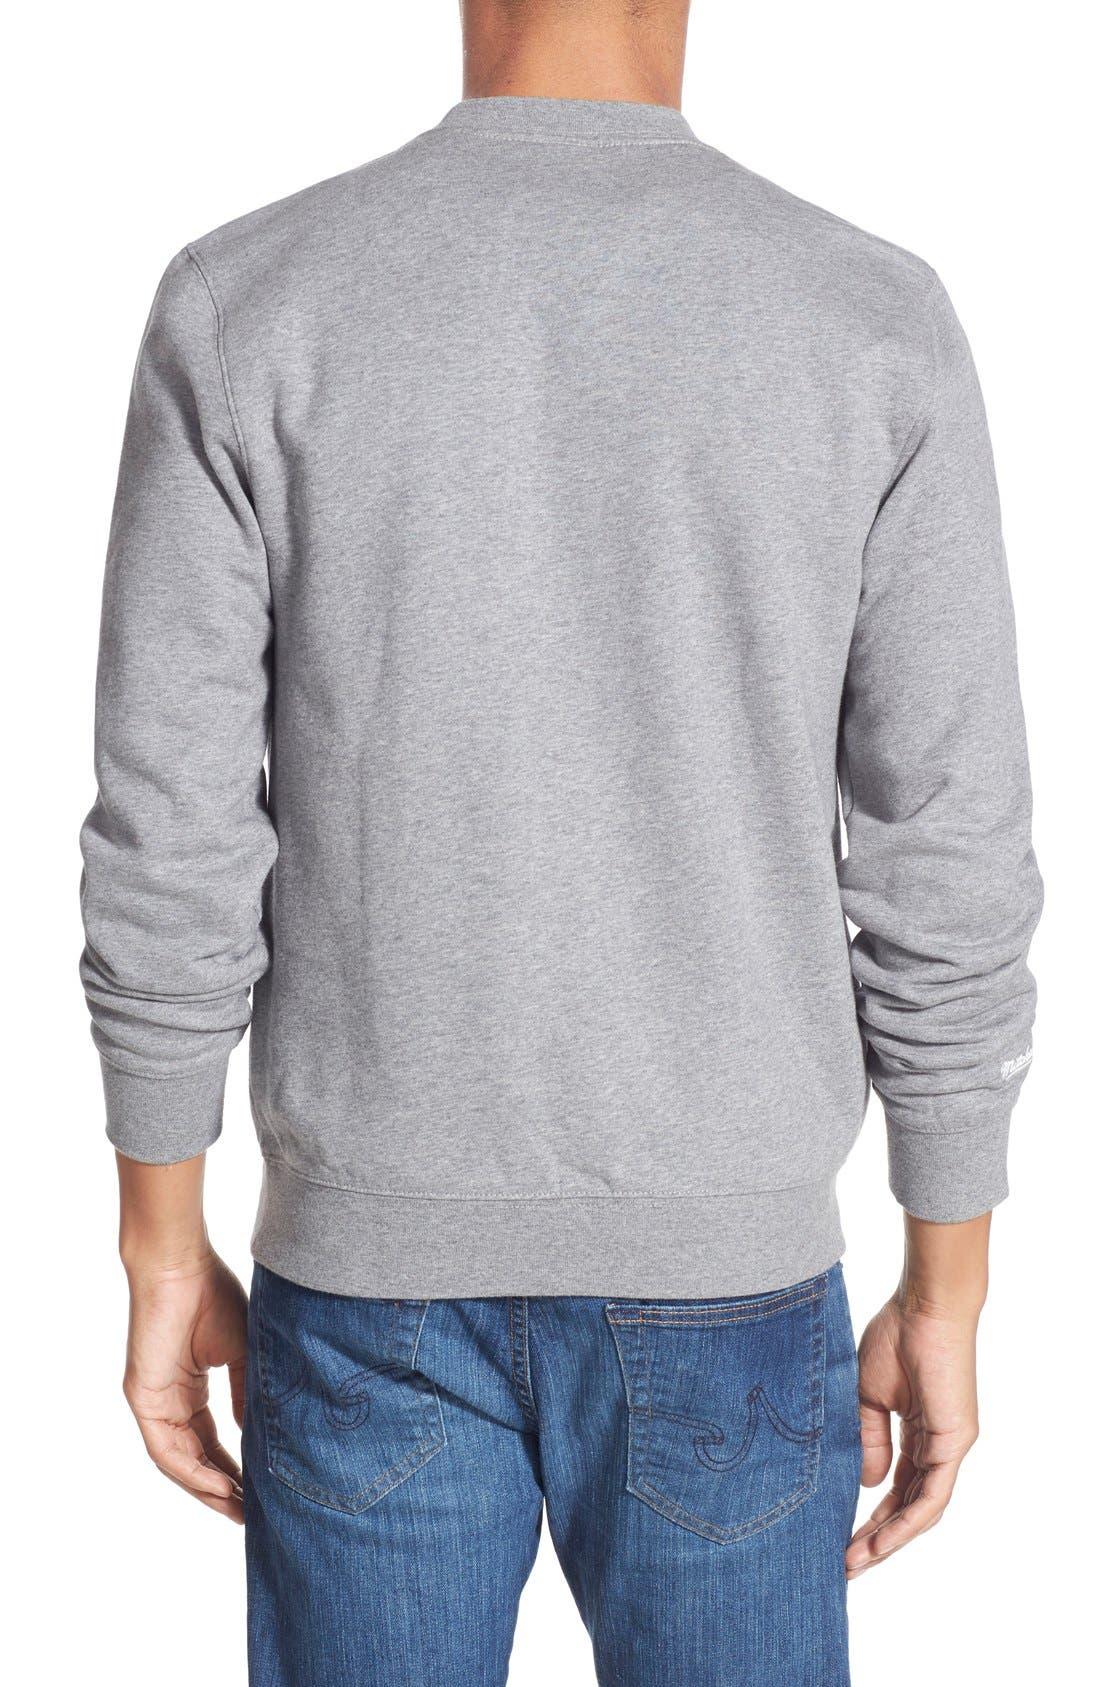 MITCHELL & NESS,                             Mitchell &Ness'Cleveland Browns' Tailored Fleece Crewneck Sweatshirt,                             Alternate thumbnail 2, color,                             061